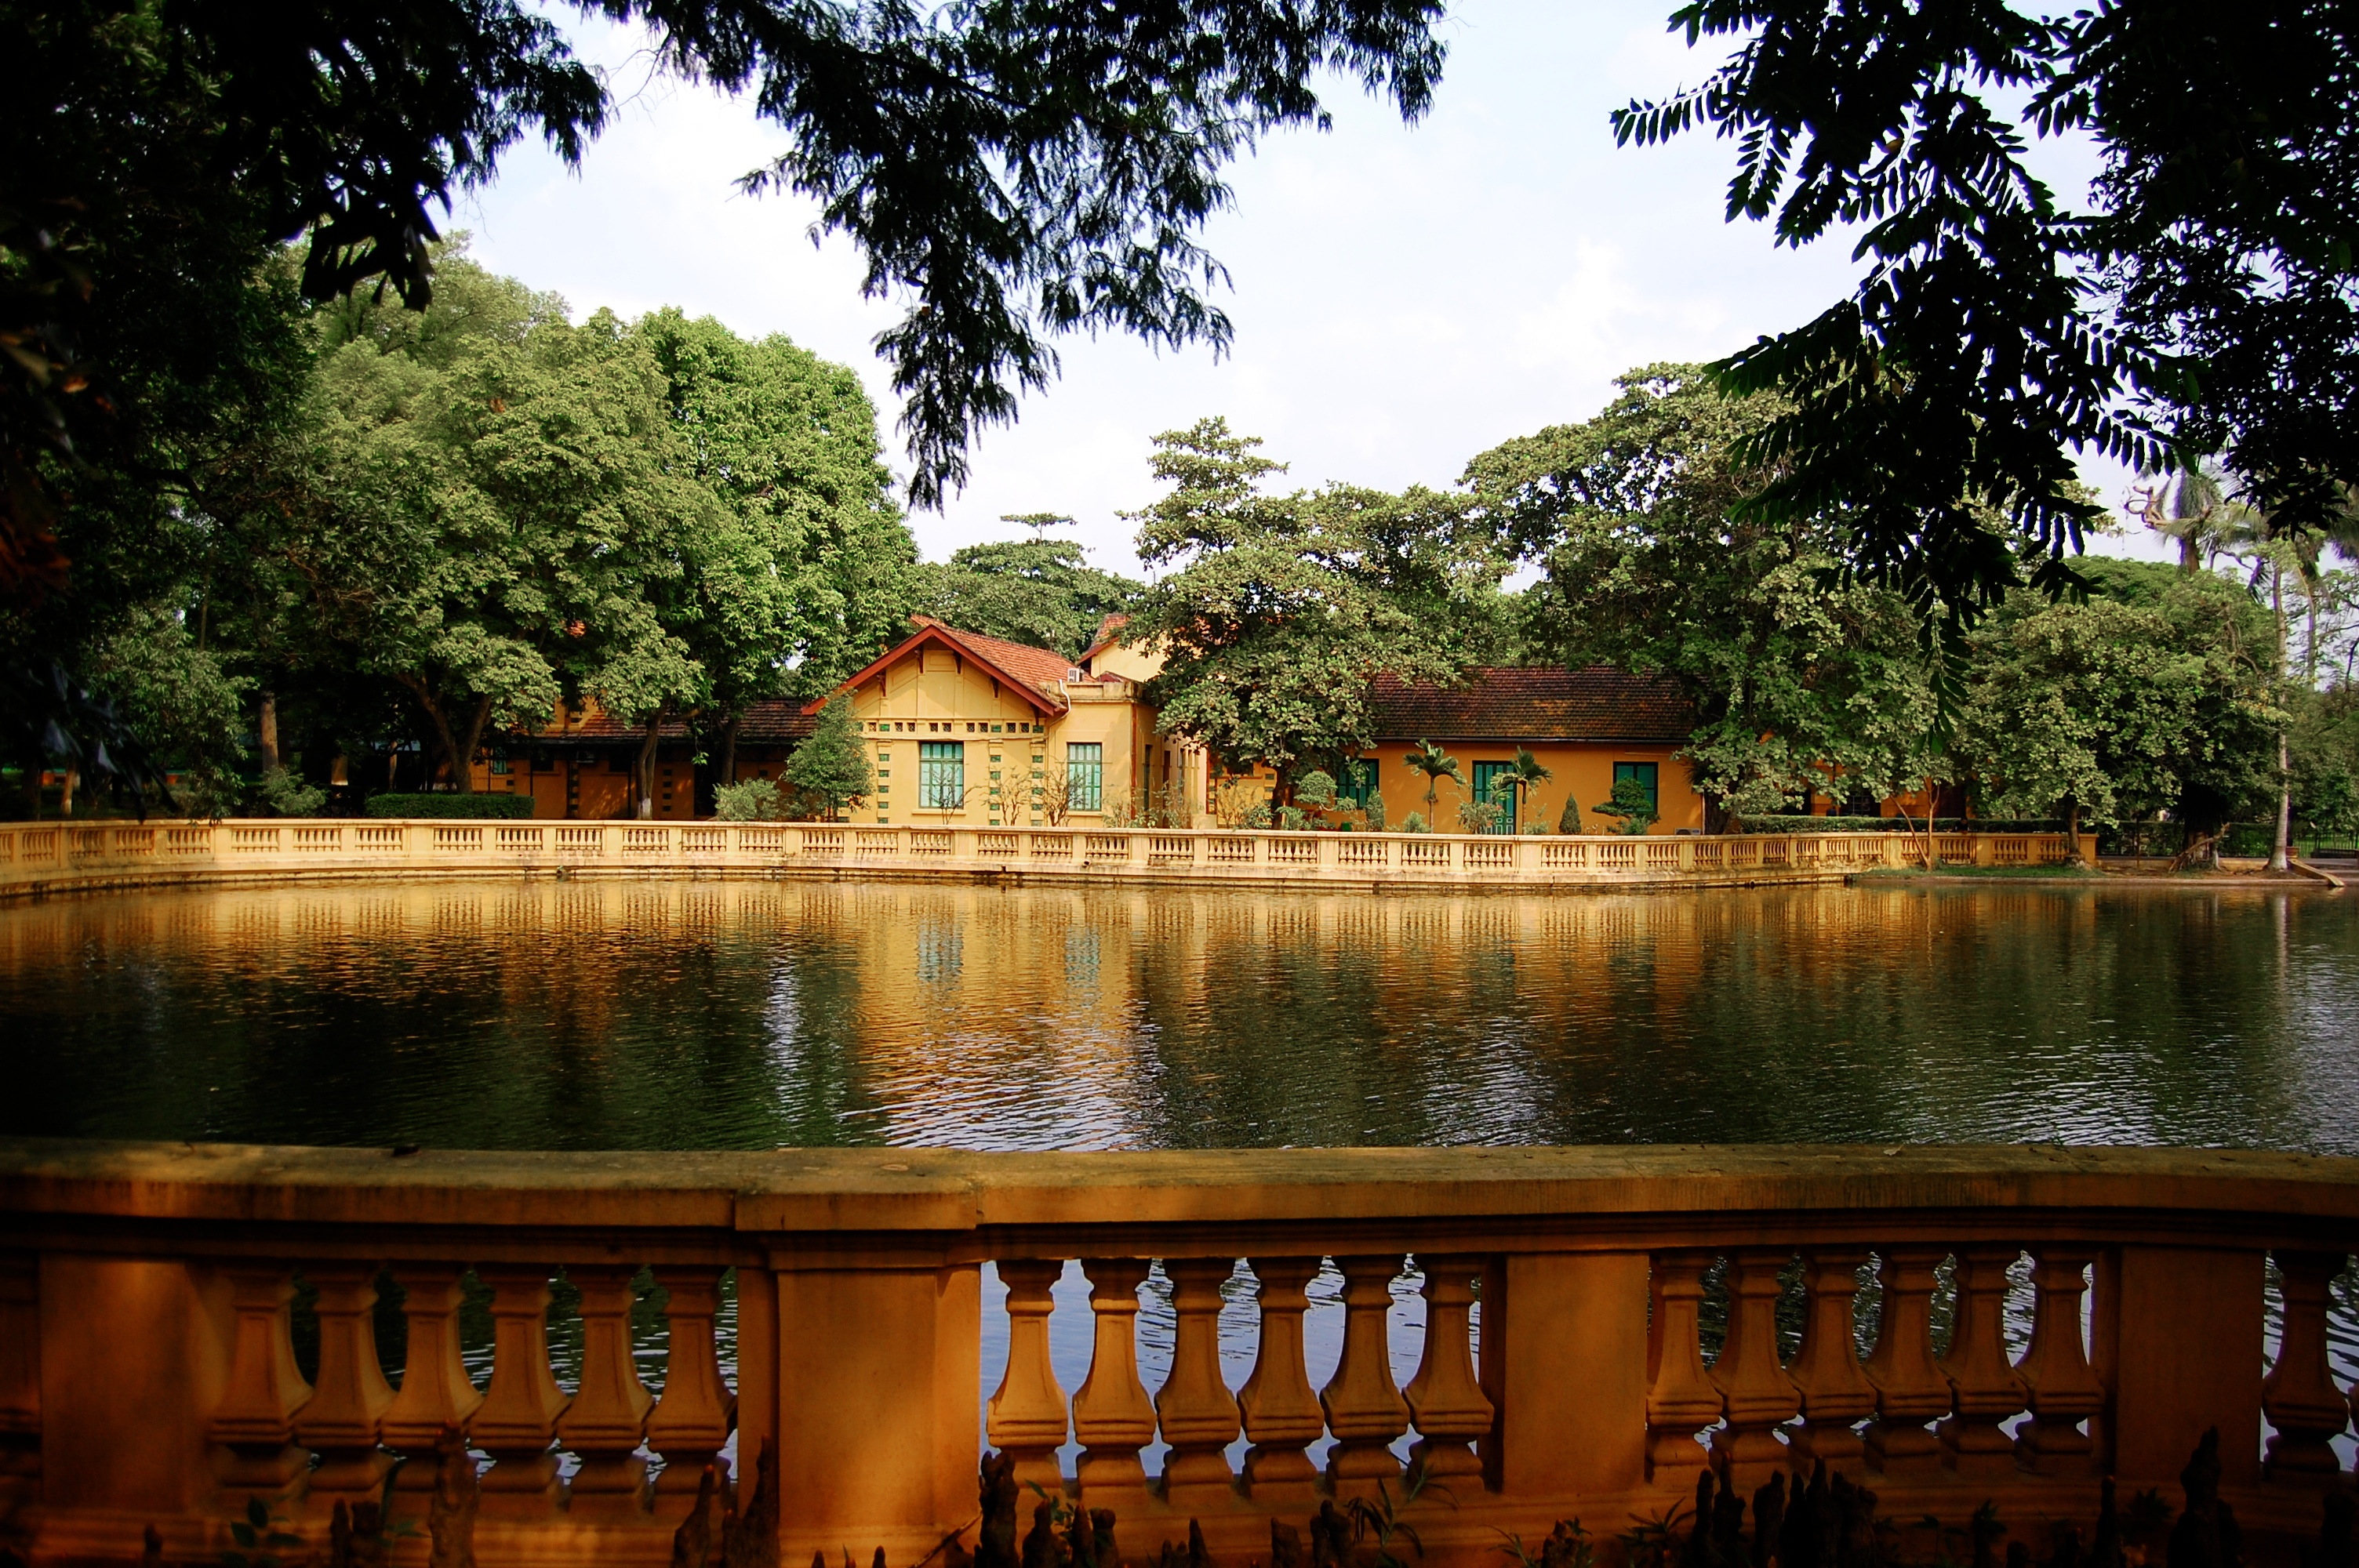 Presidential_House_Hanoi_2803356508_5221a7a0da